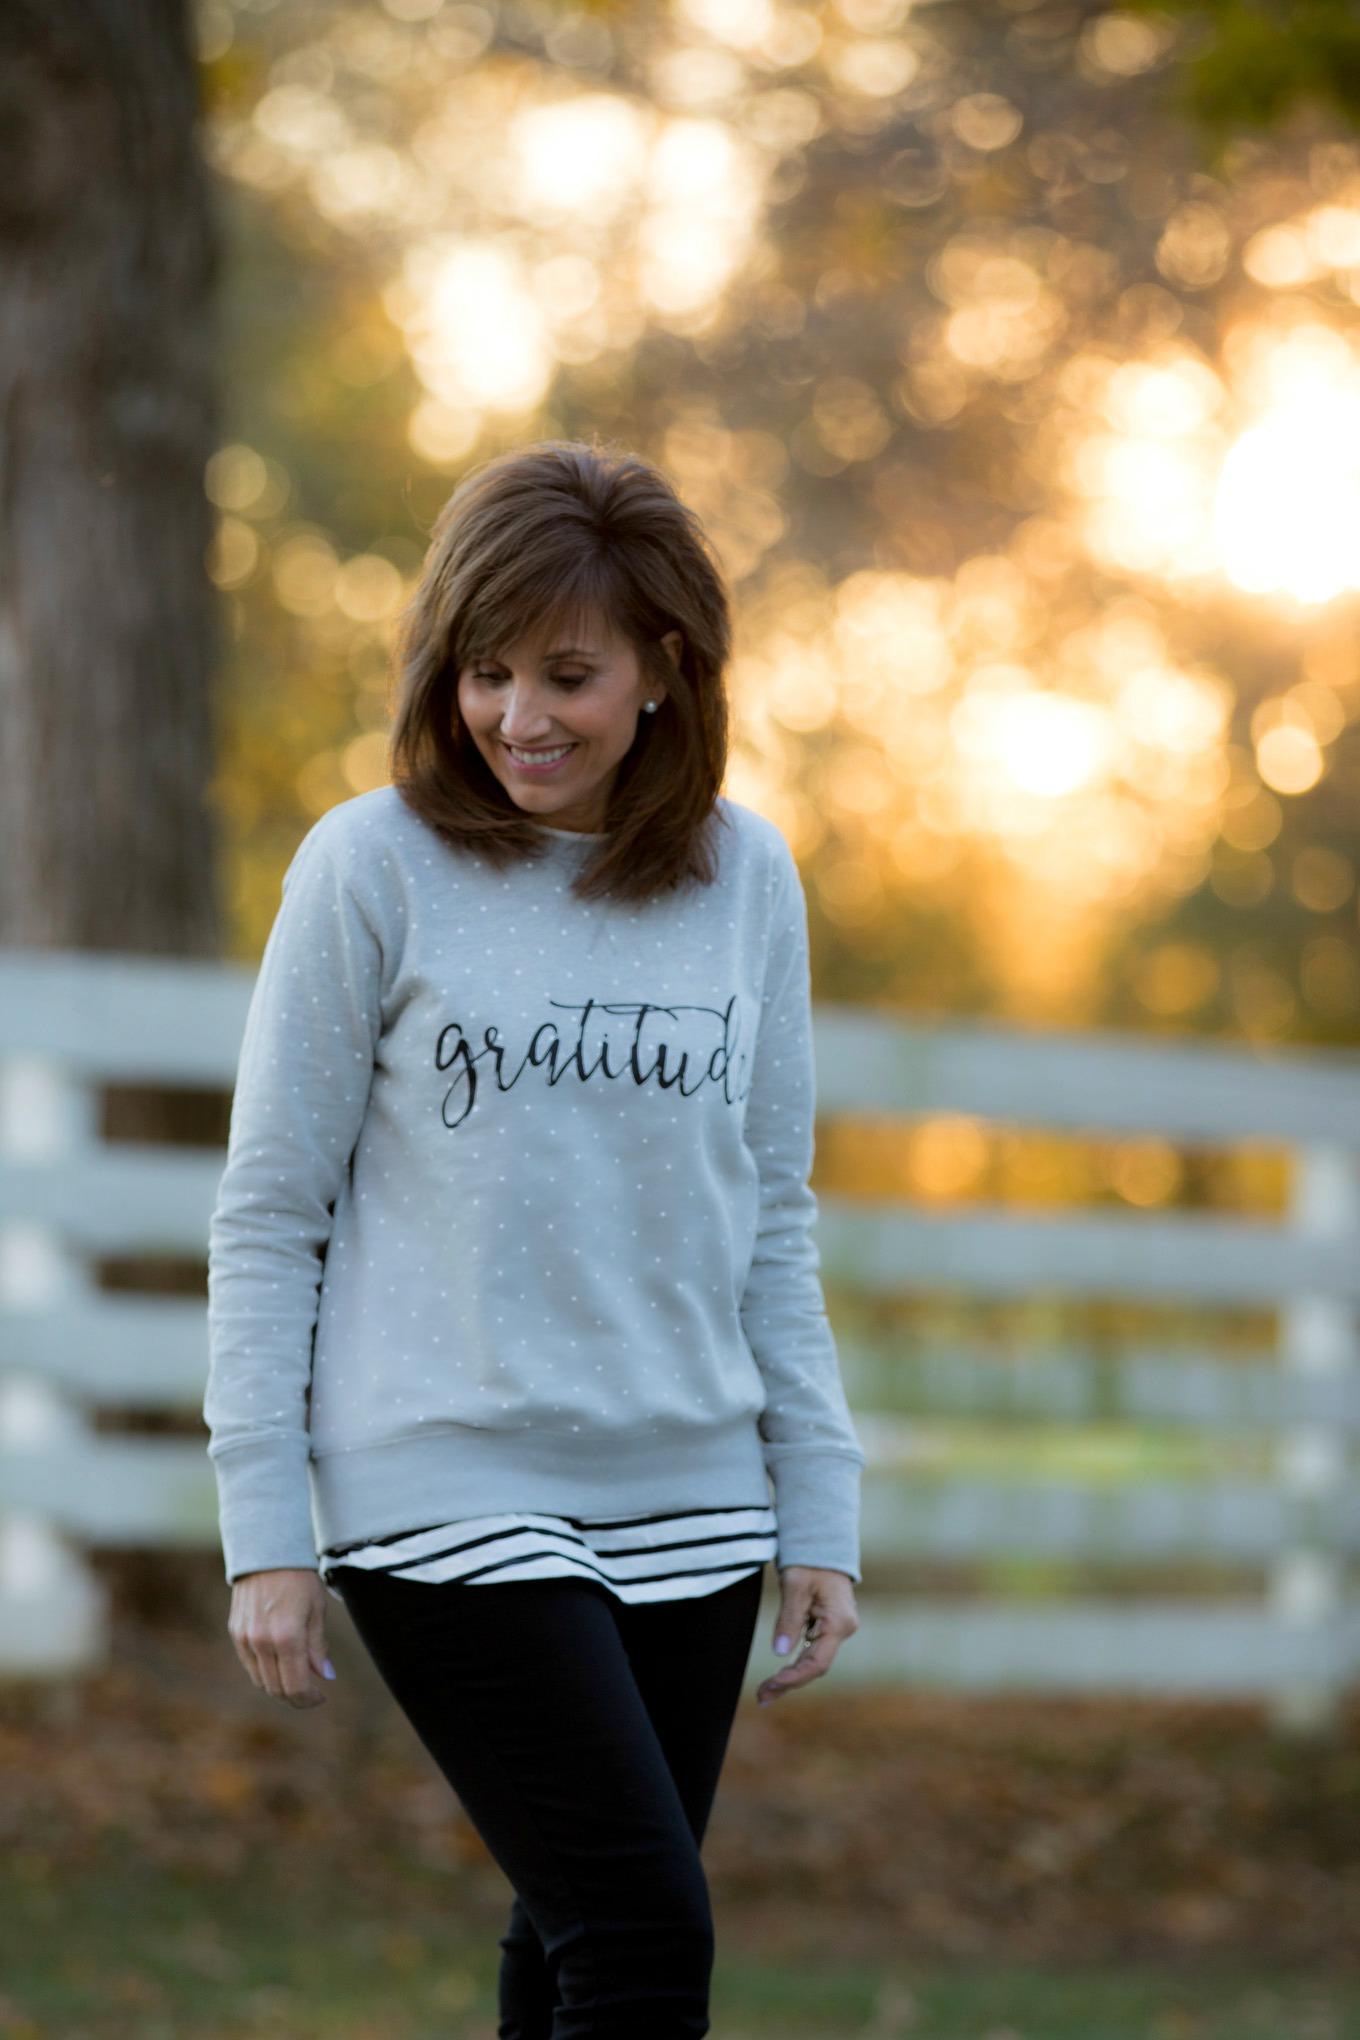 Fashion blogger, Cyndi Spivey, sharing a gratitude sweatshirt from Glamour Farms Boutique.